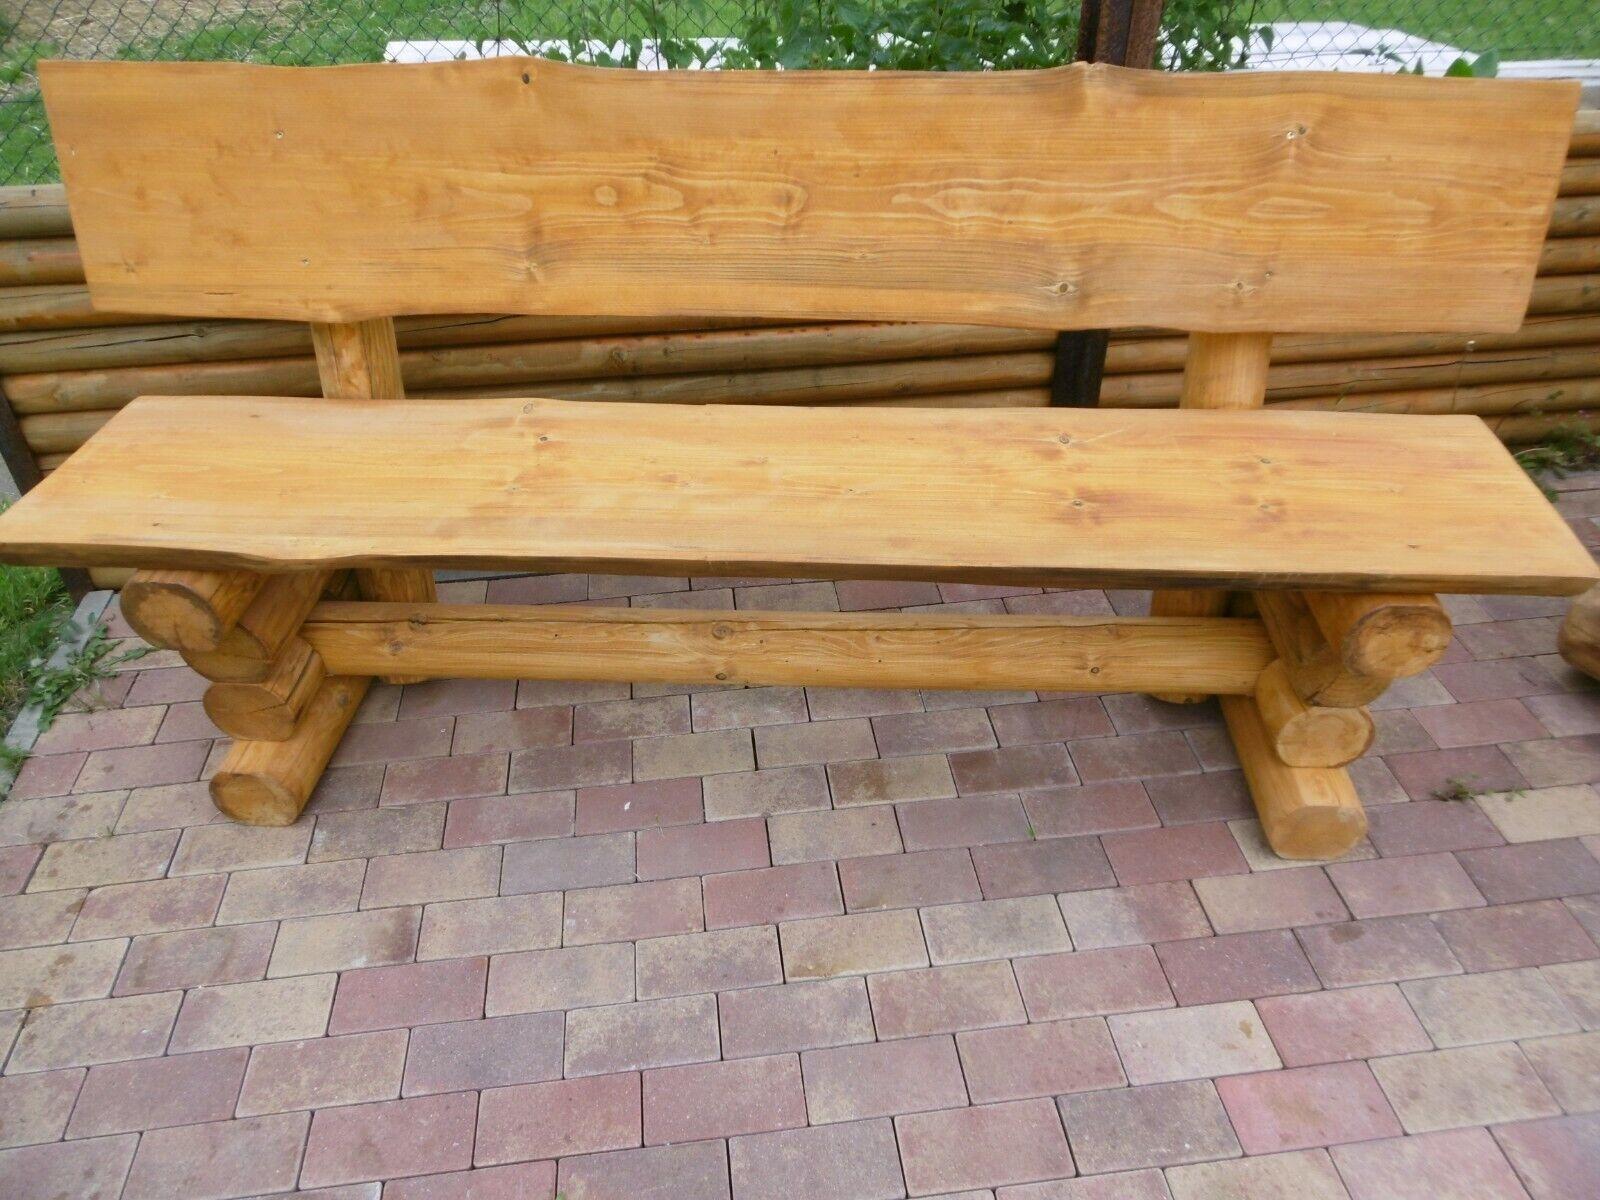 Holzbank Gartenbank Sitzbank Bänke Massivholz aus Sibirischer Lärche